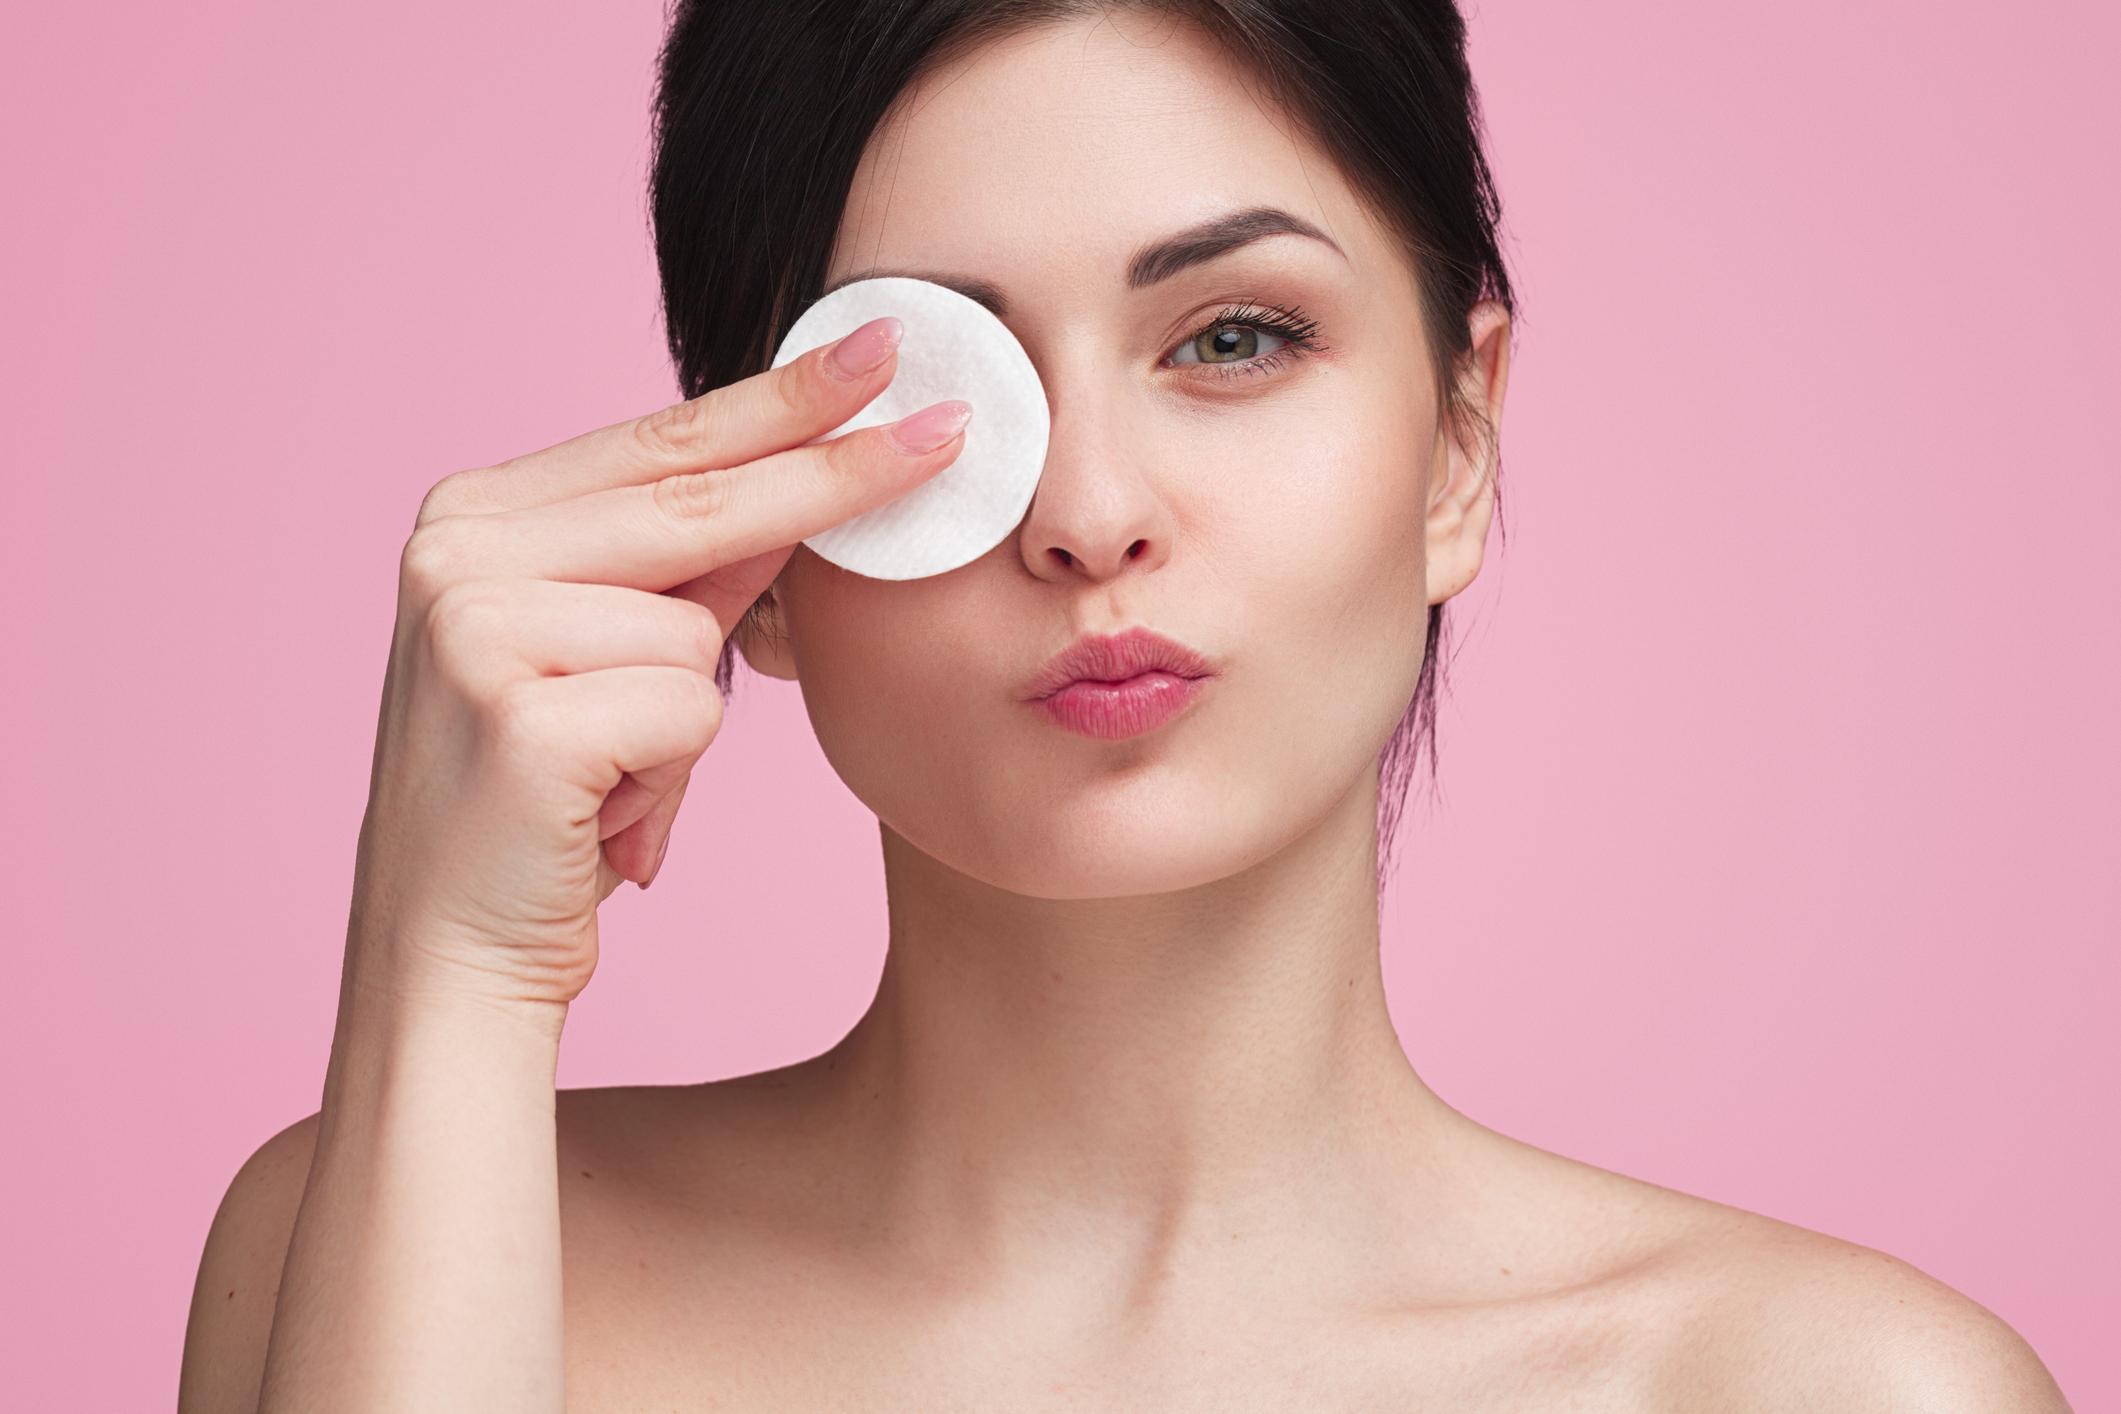 utiliza maquillaje que tenga base agua para que no necesites utilizar desmaquillante oleoso